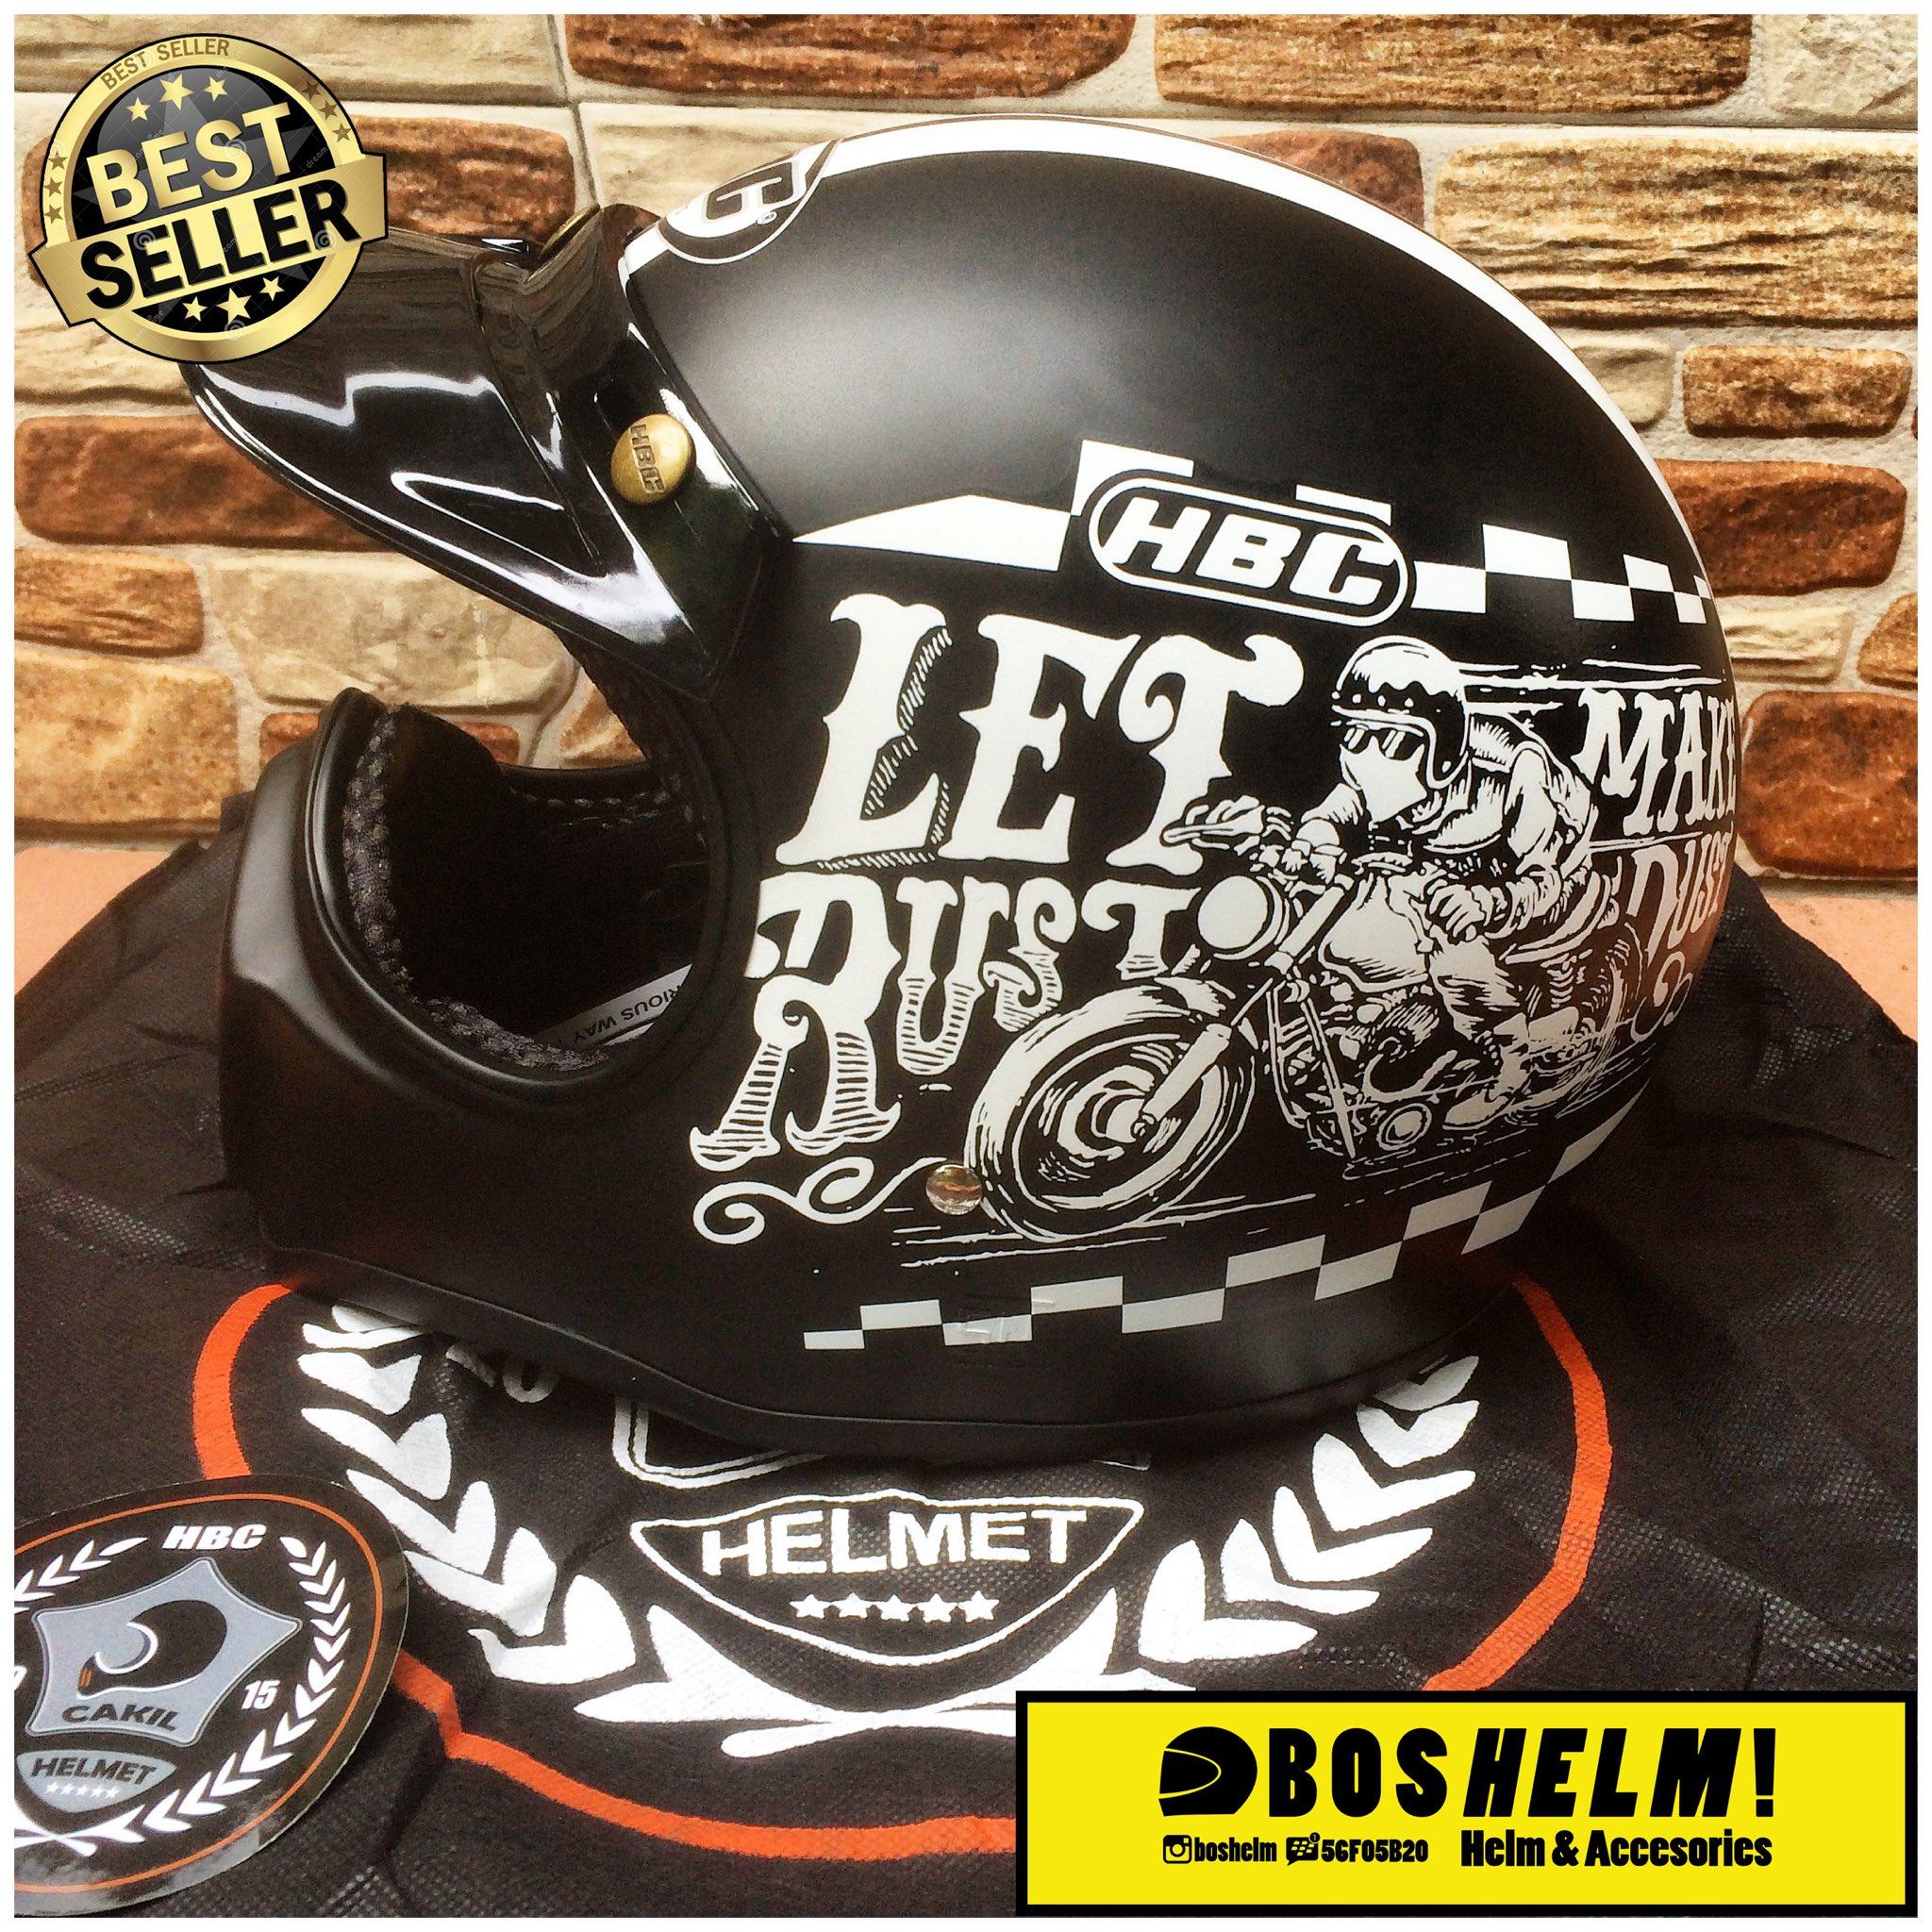 Helm Cakil Hbc Rust Dust Gading Motif Cream Size Ready S M L Xl Steve Legend Hitam Doff Source